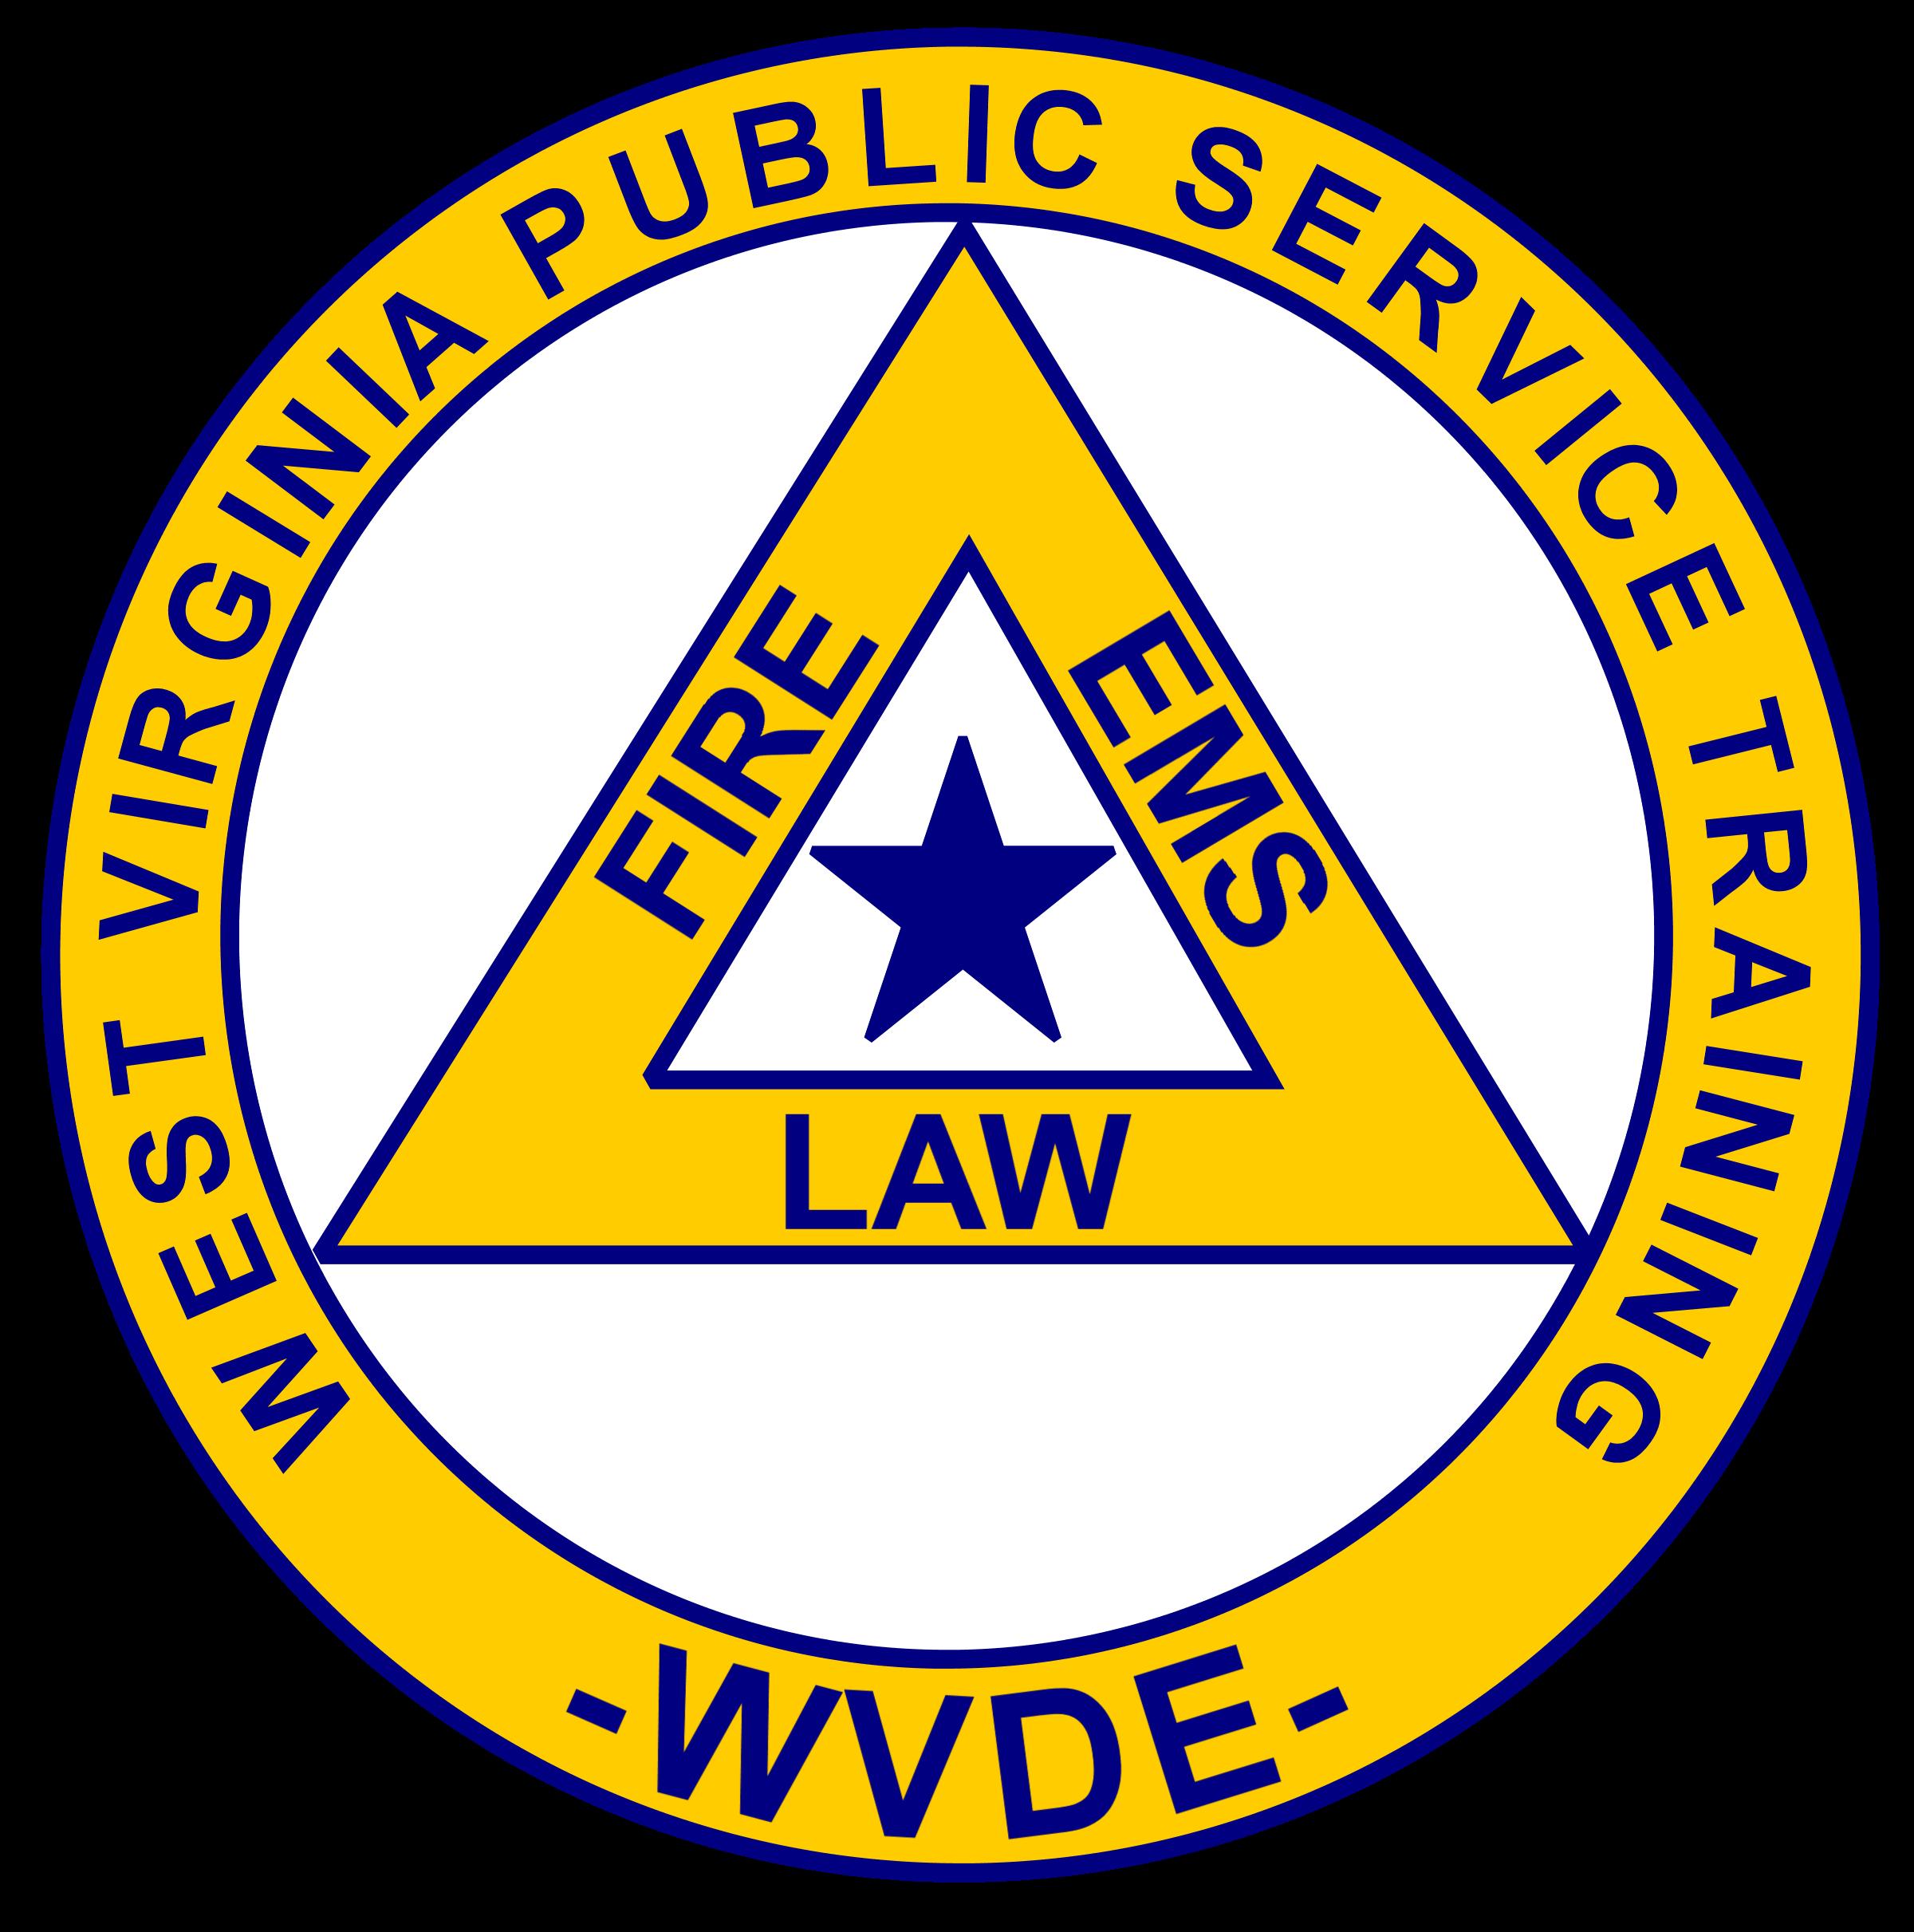 West Virginia Public Service Training logo